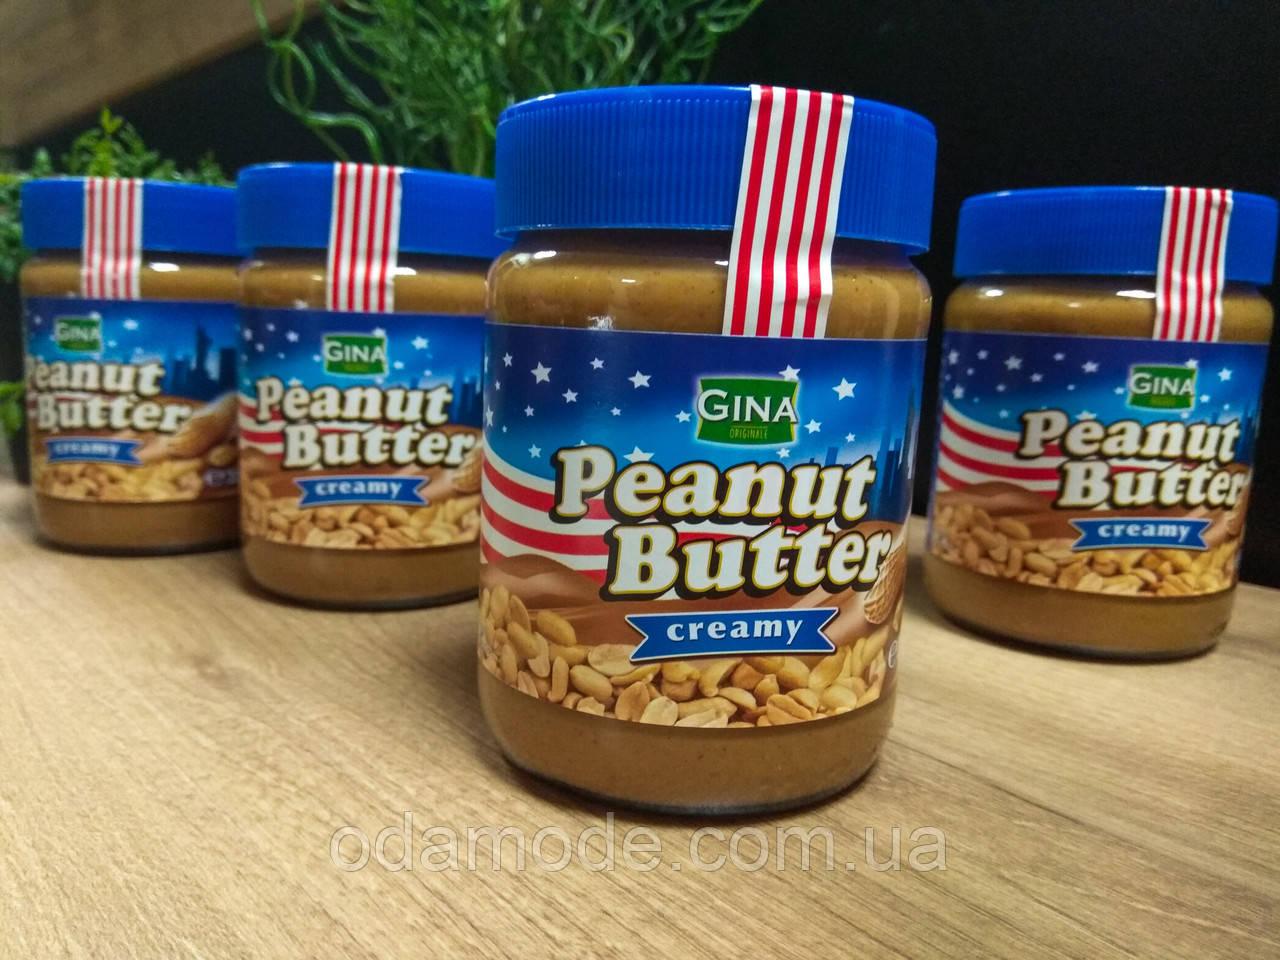 Арахісова Паста кремова Peanut Butter creamy Gina 350 г